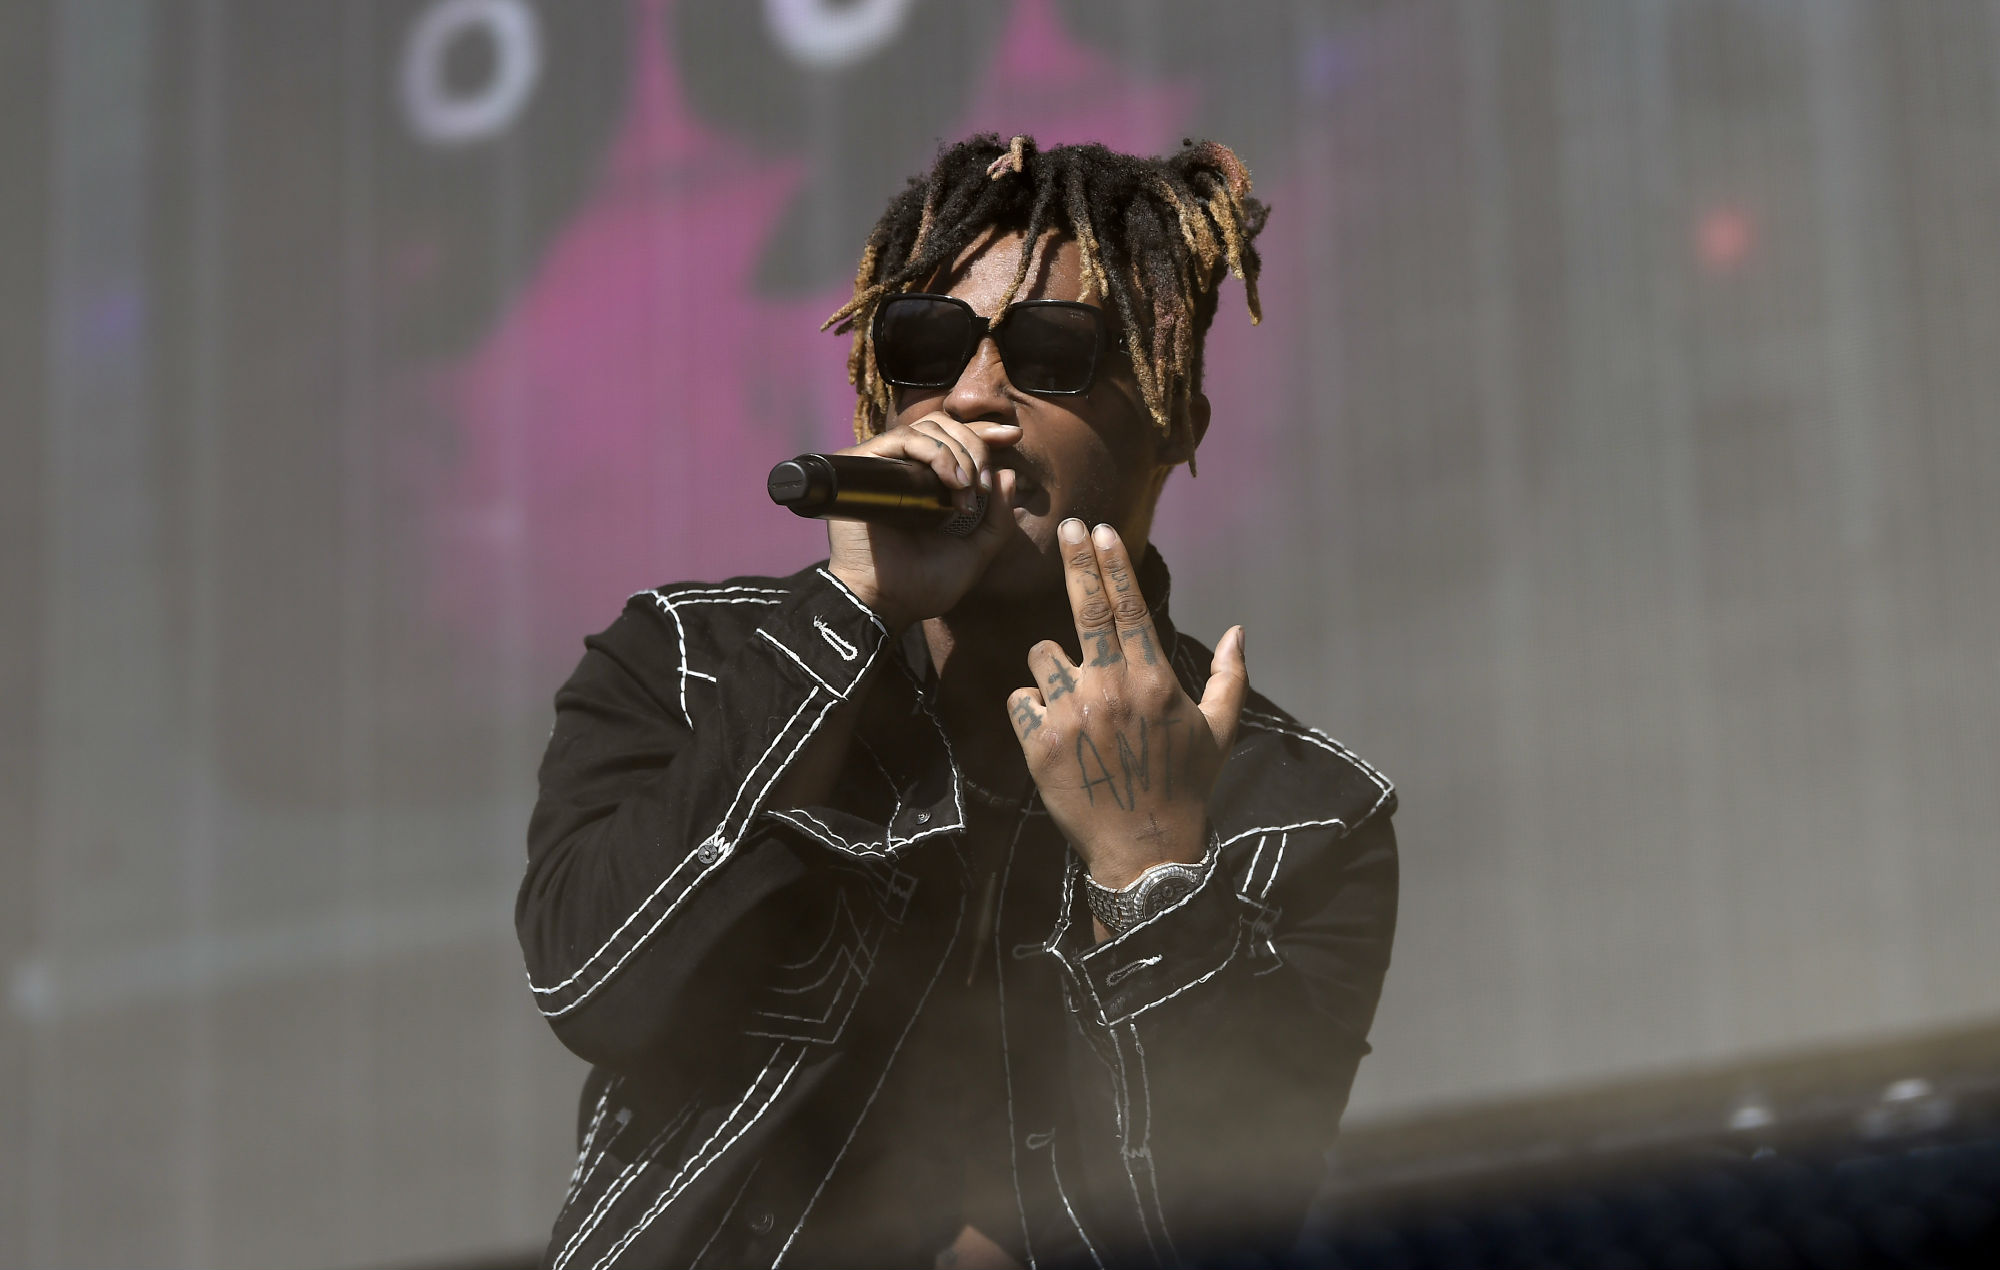 roses juice wrld roblox id code Juice Wrld S Family Break Silence On Rapper S Death Addiction Knows No Boundaries